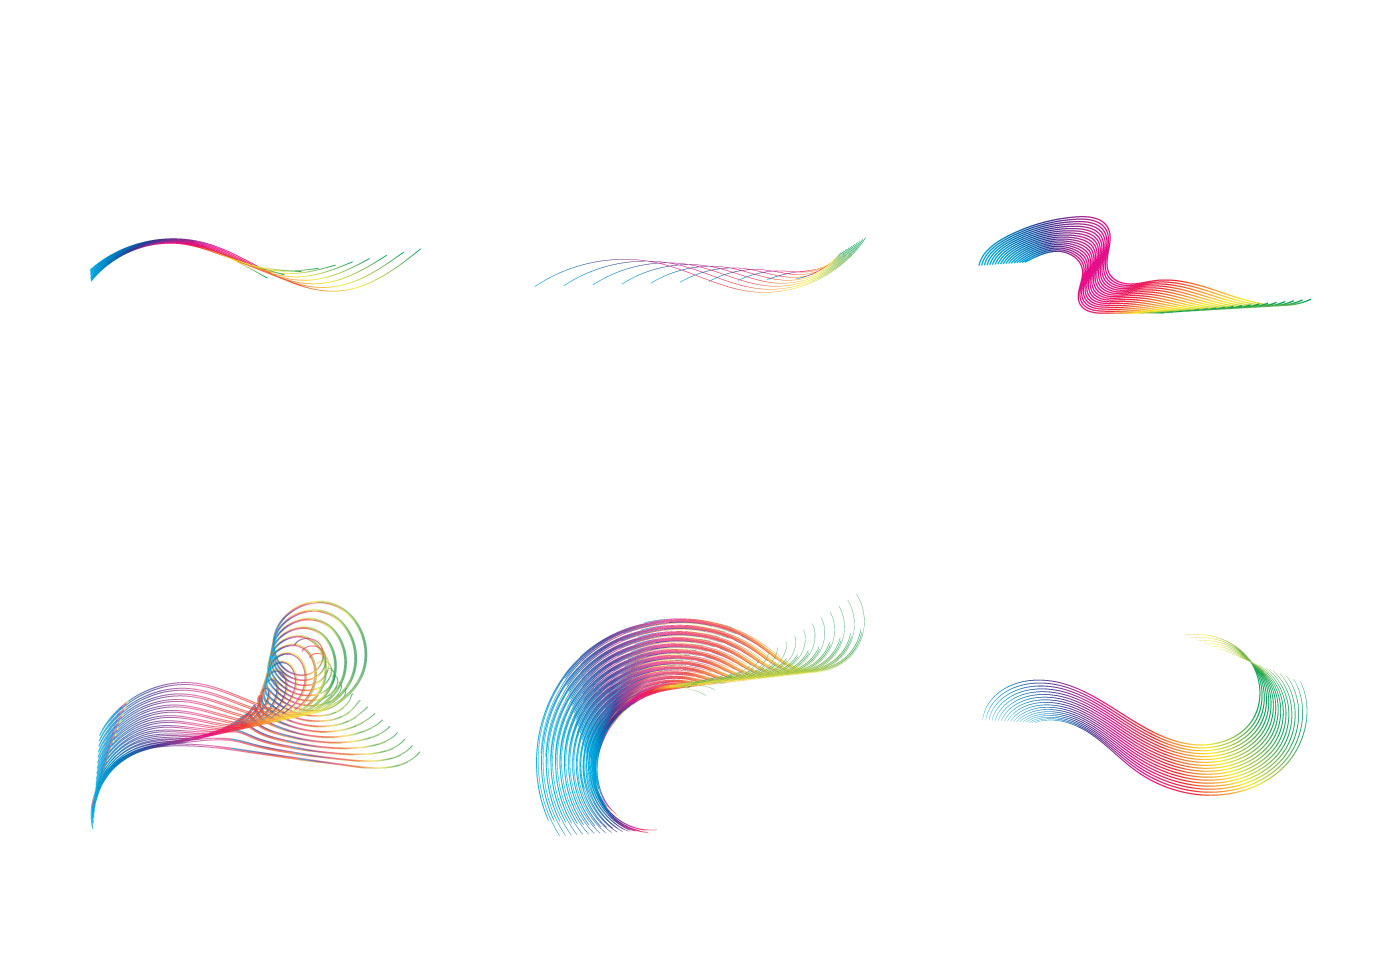 Free Swish Vector Illustration Download Free Vector Art